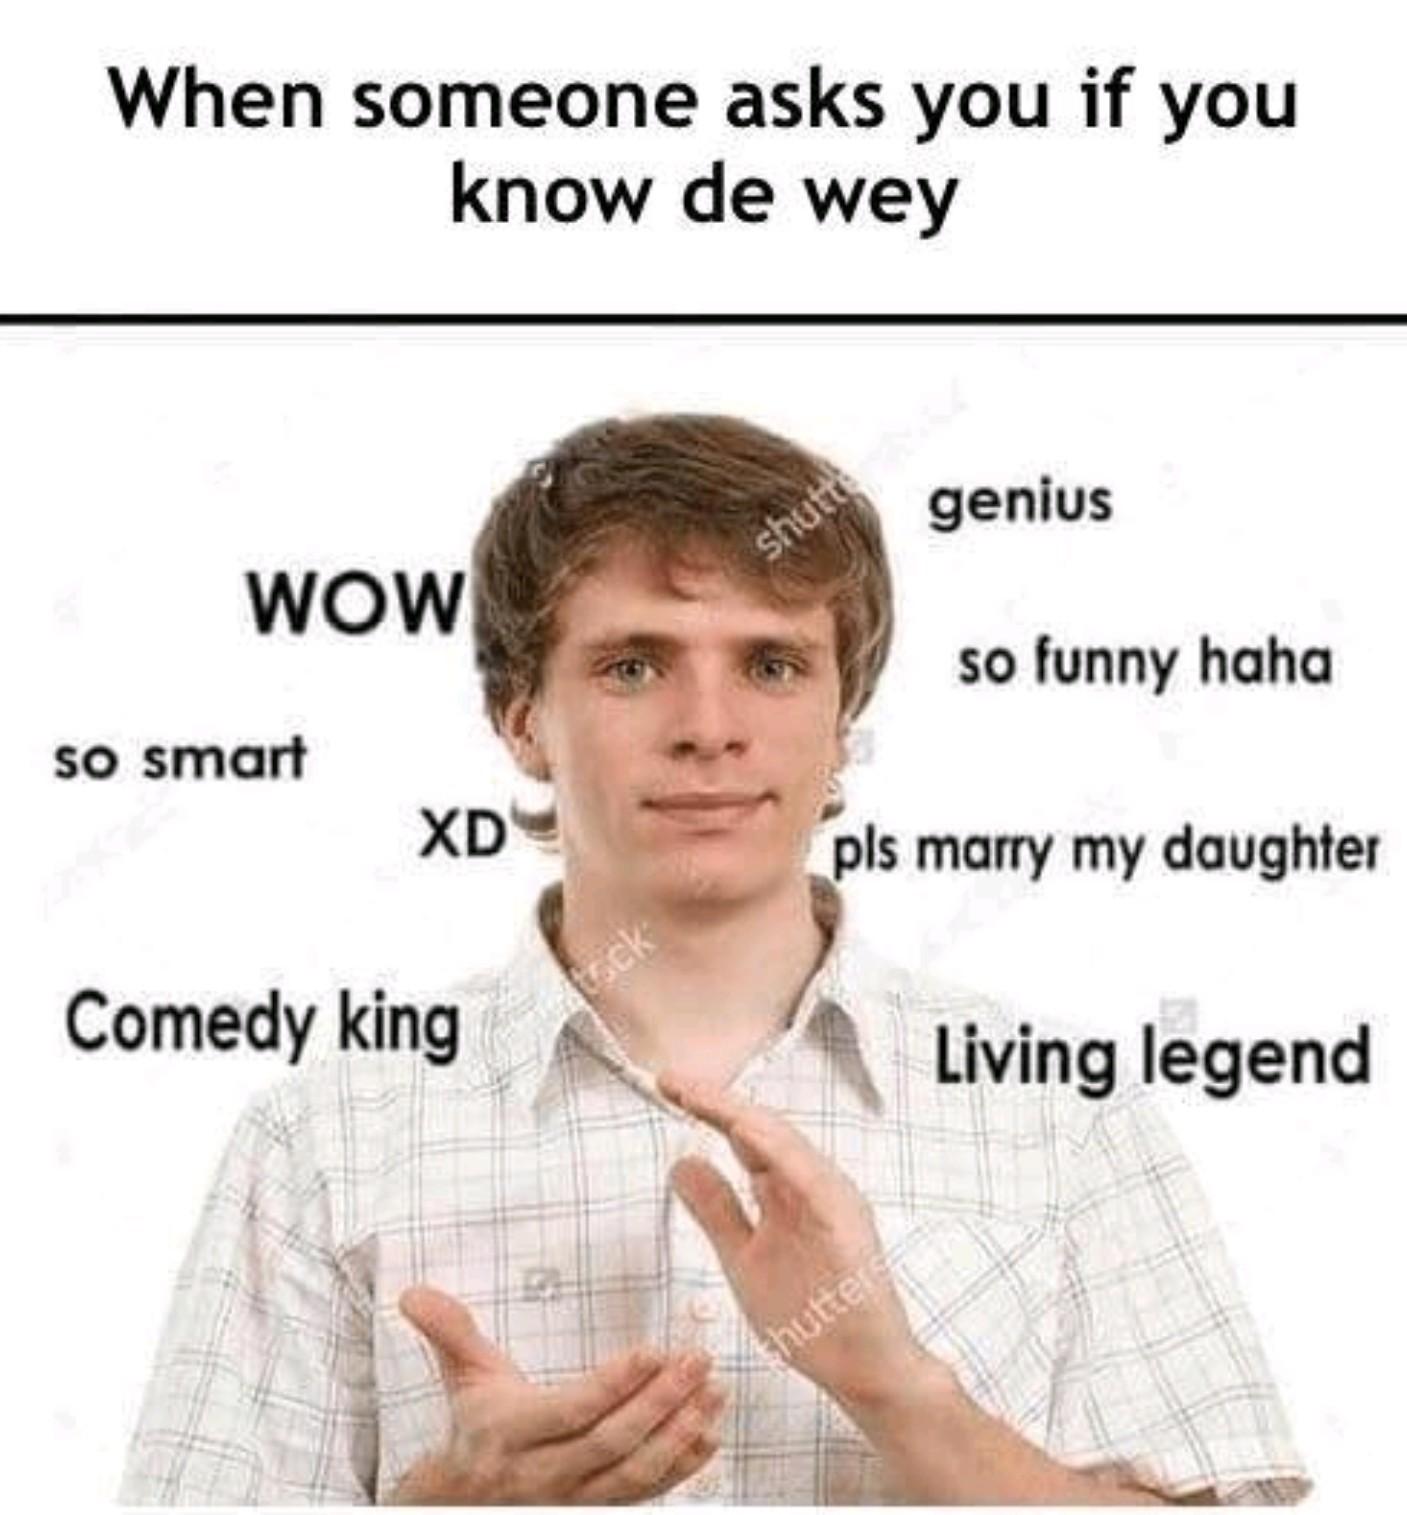 Wow so smart - meme